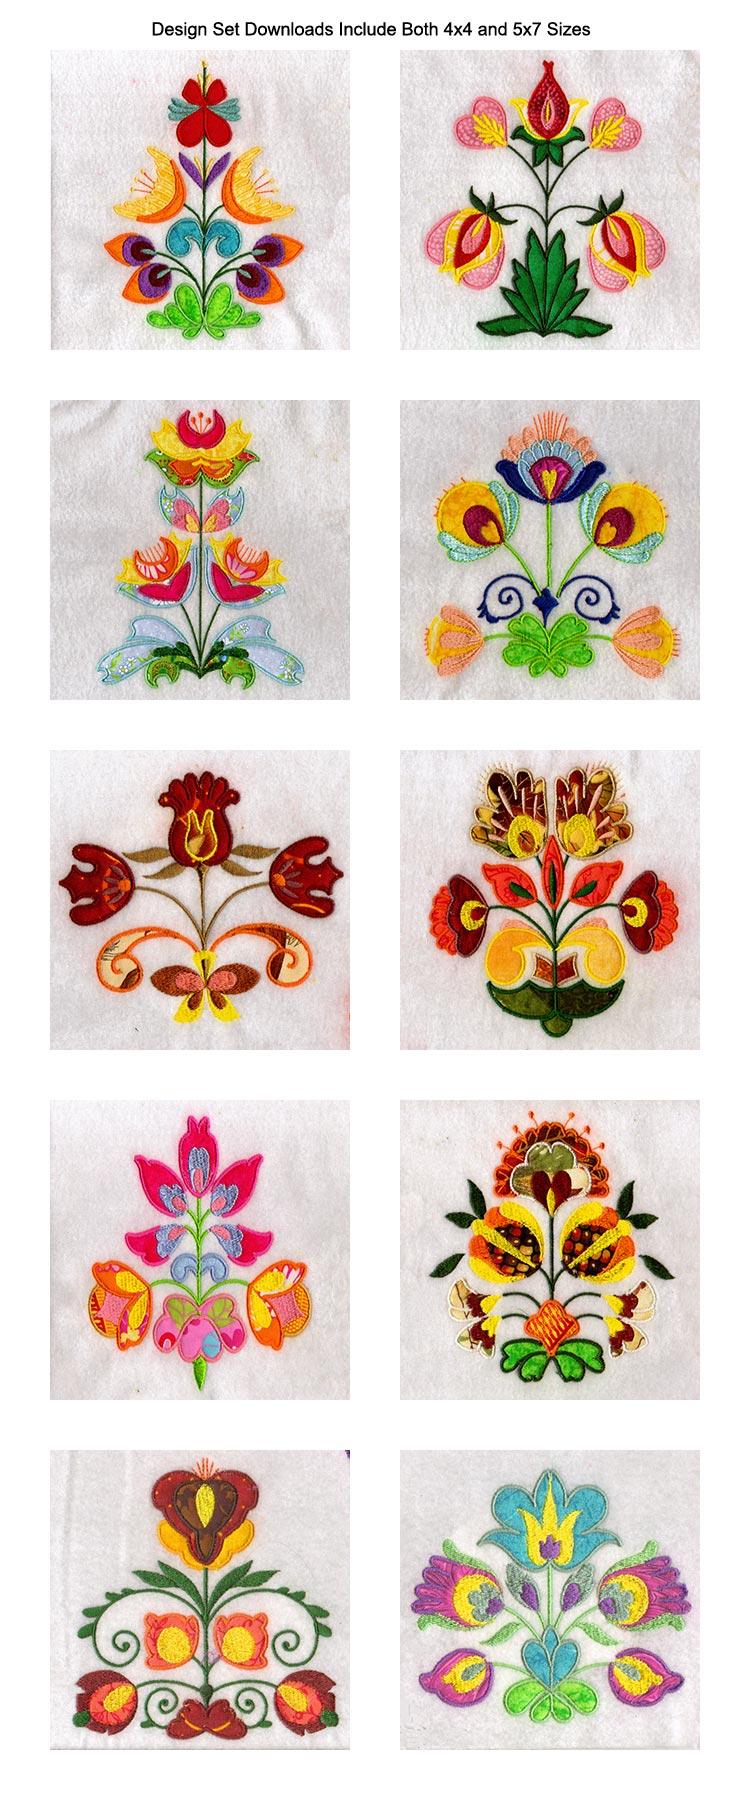 Applique folkart flowers machine embroidery designs ebay